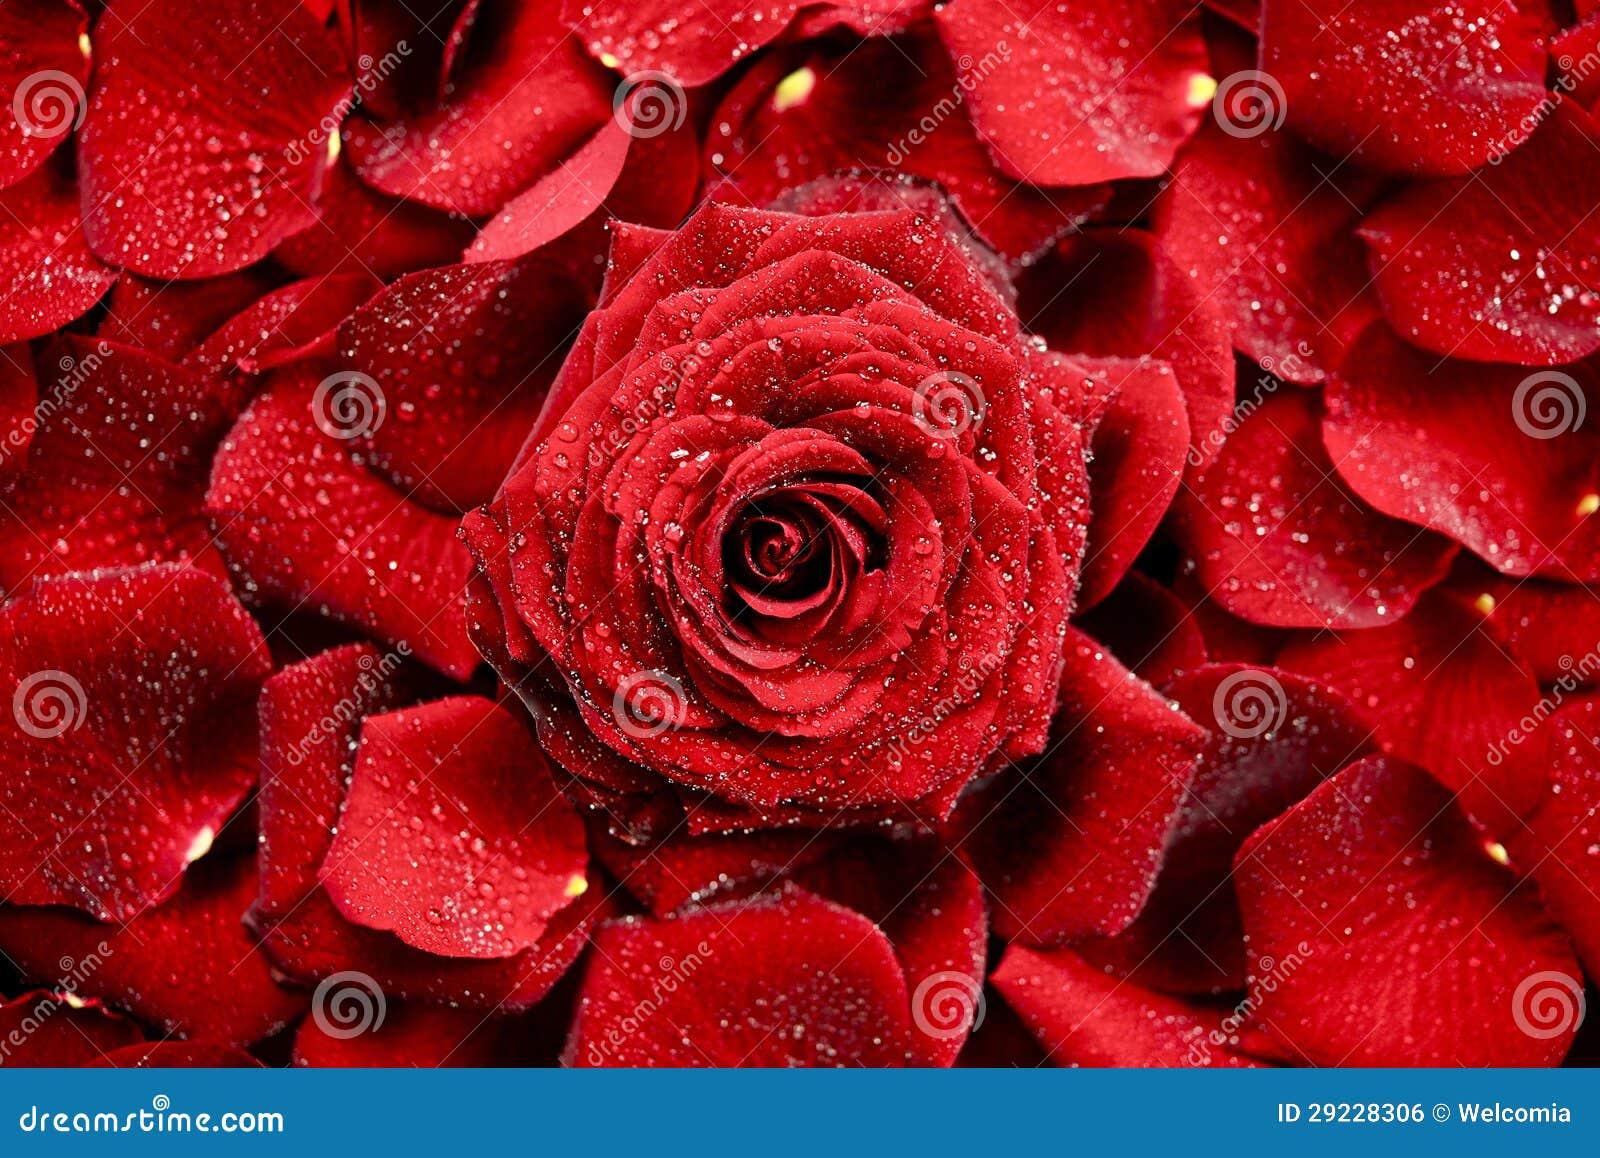 Download Fundo de Rosa vermelha foto de stock. Imagem de backdrop - 29228306